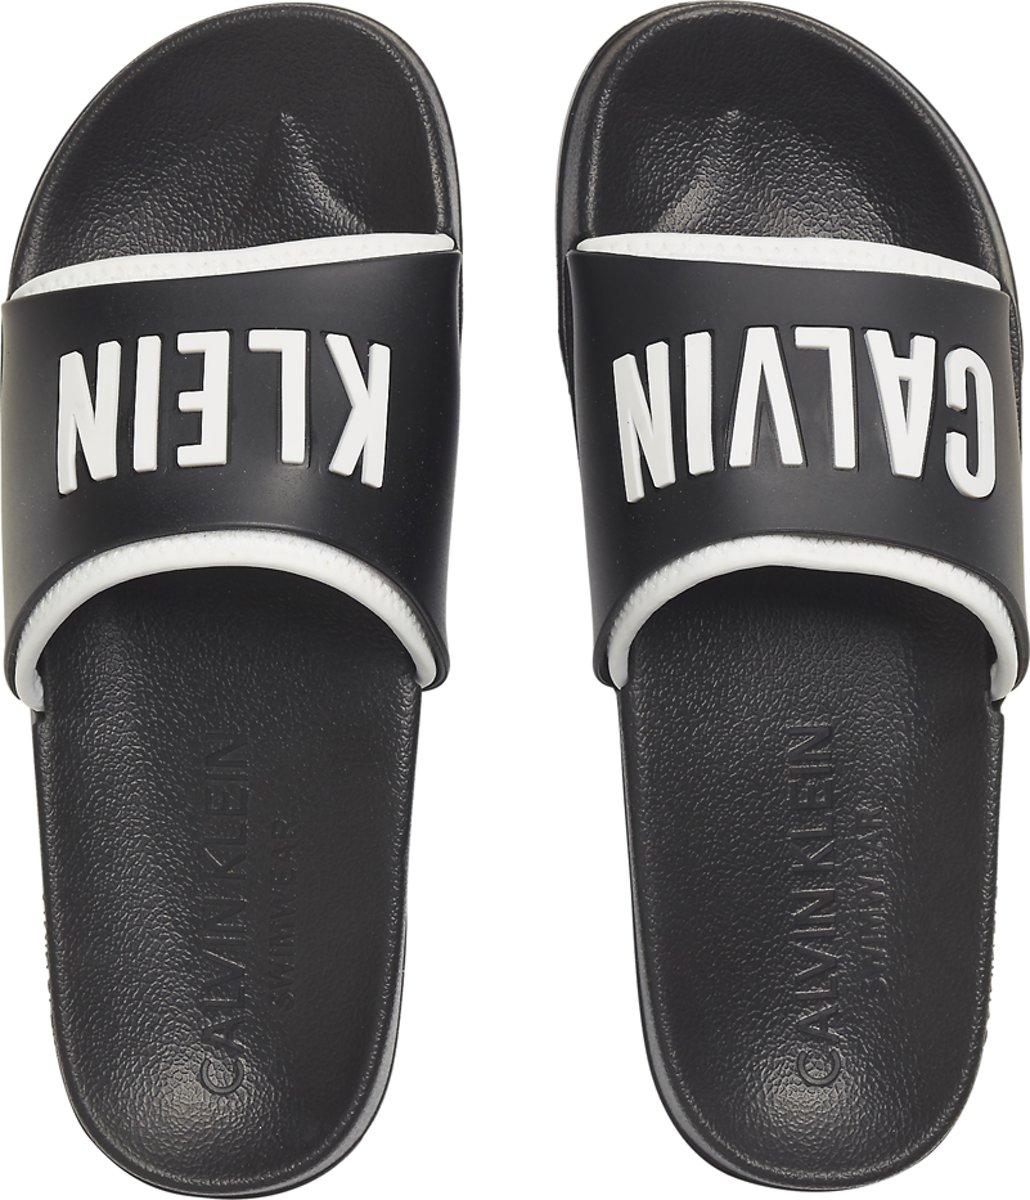 Calvin Klein - Slide Badslippers Zwart Wit - 41-42 kopen